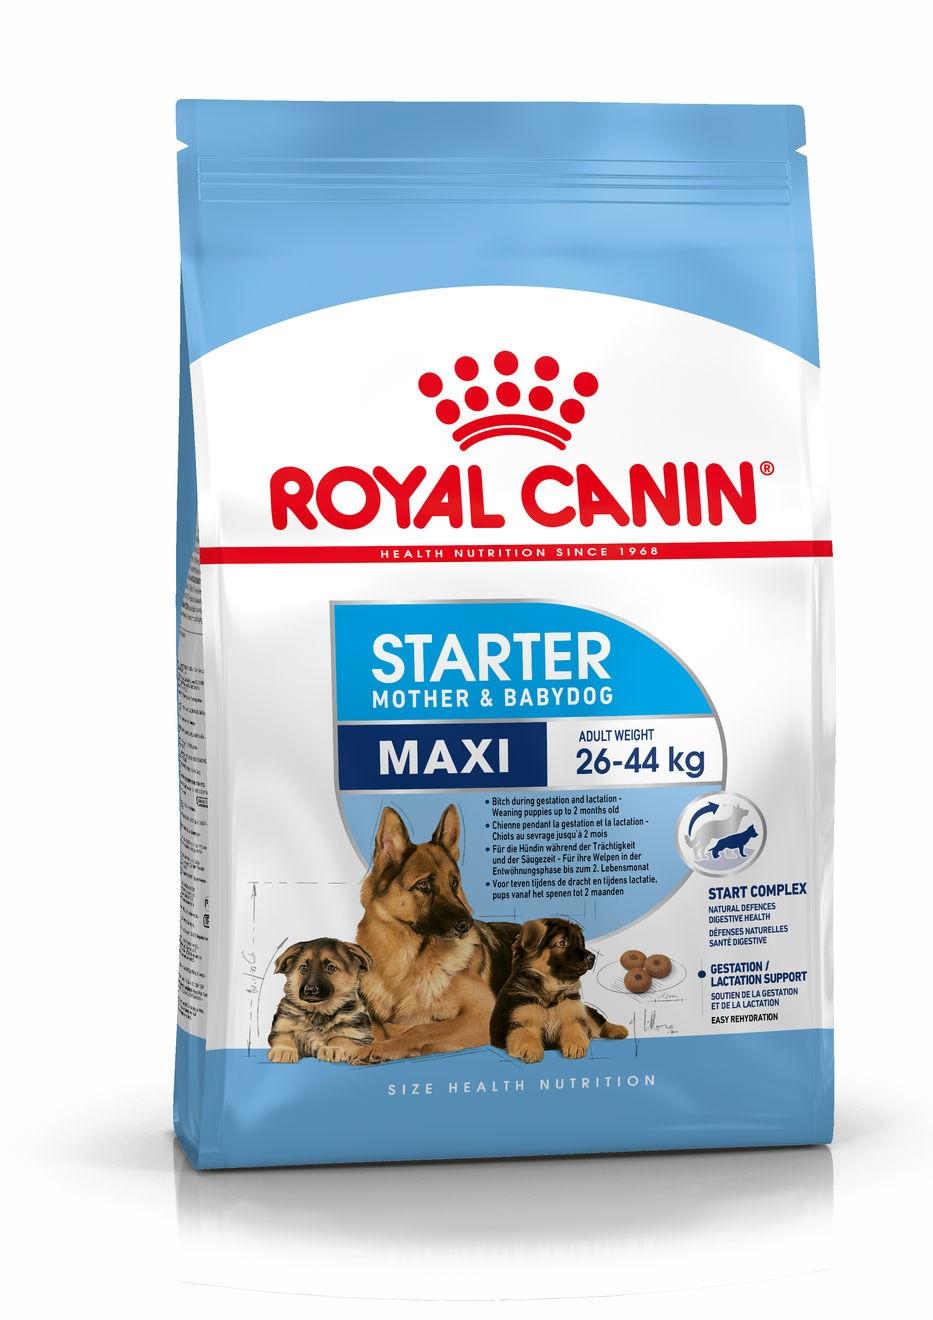 Maxi Starter Mother & Babydog